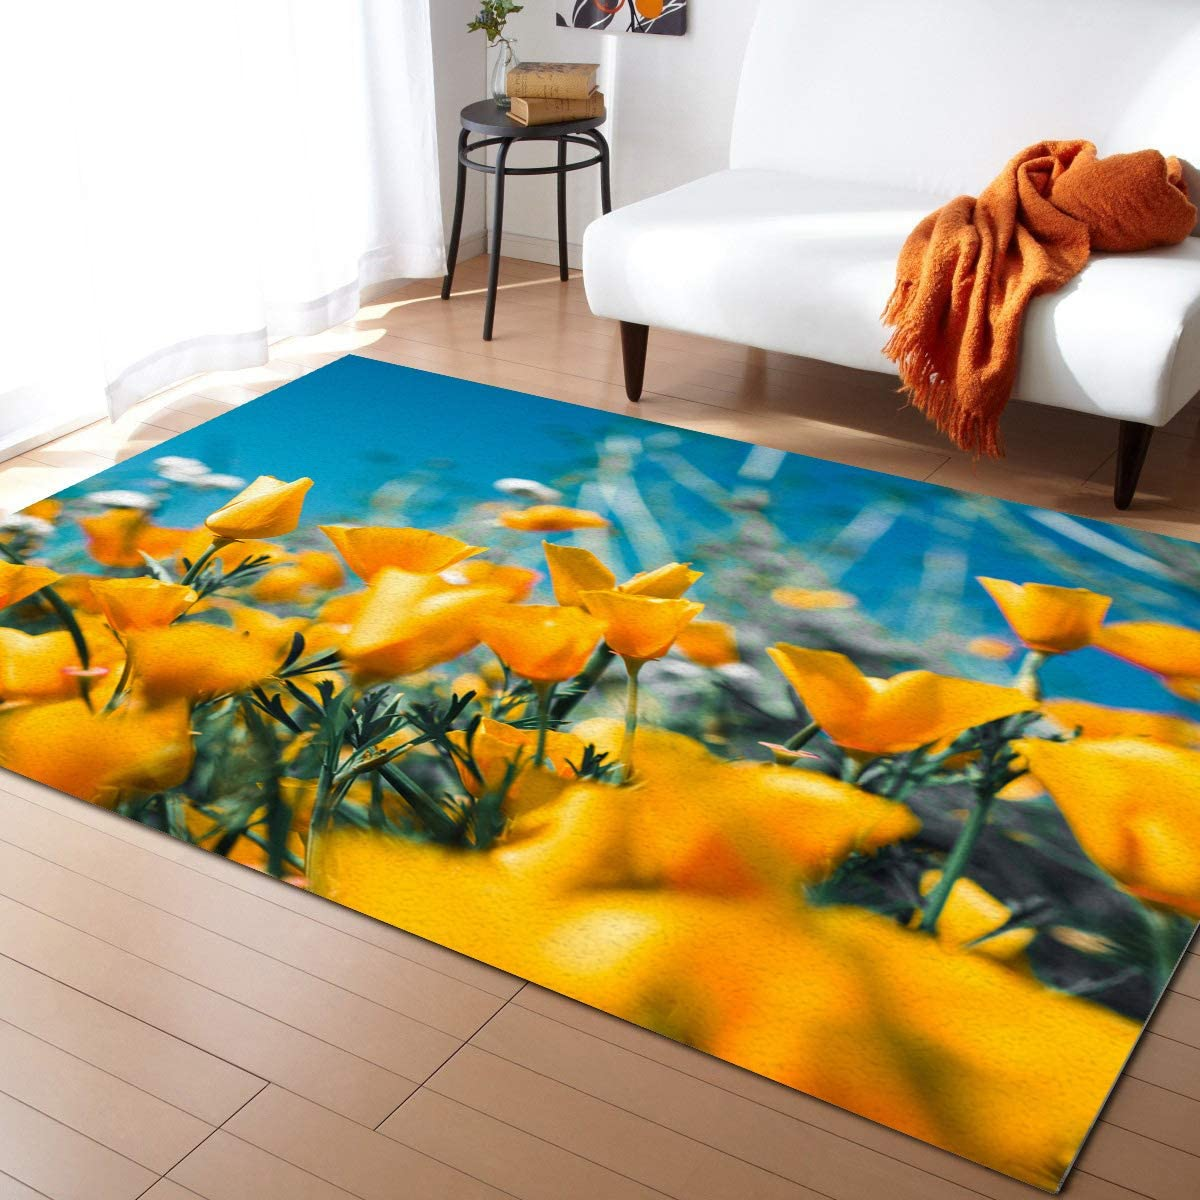 Advancey Indoor High-Low 毎日激安特売で 営業中です Area Rug 高品質 2'x3' Tulip Summer Yellow Flow